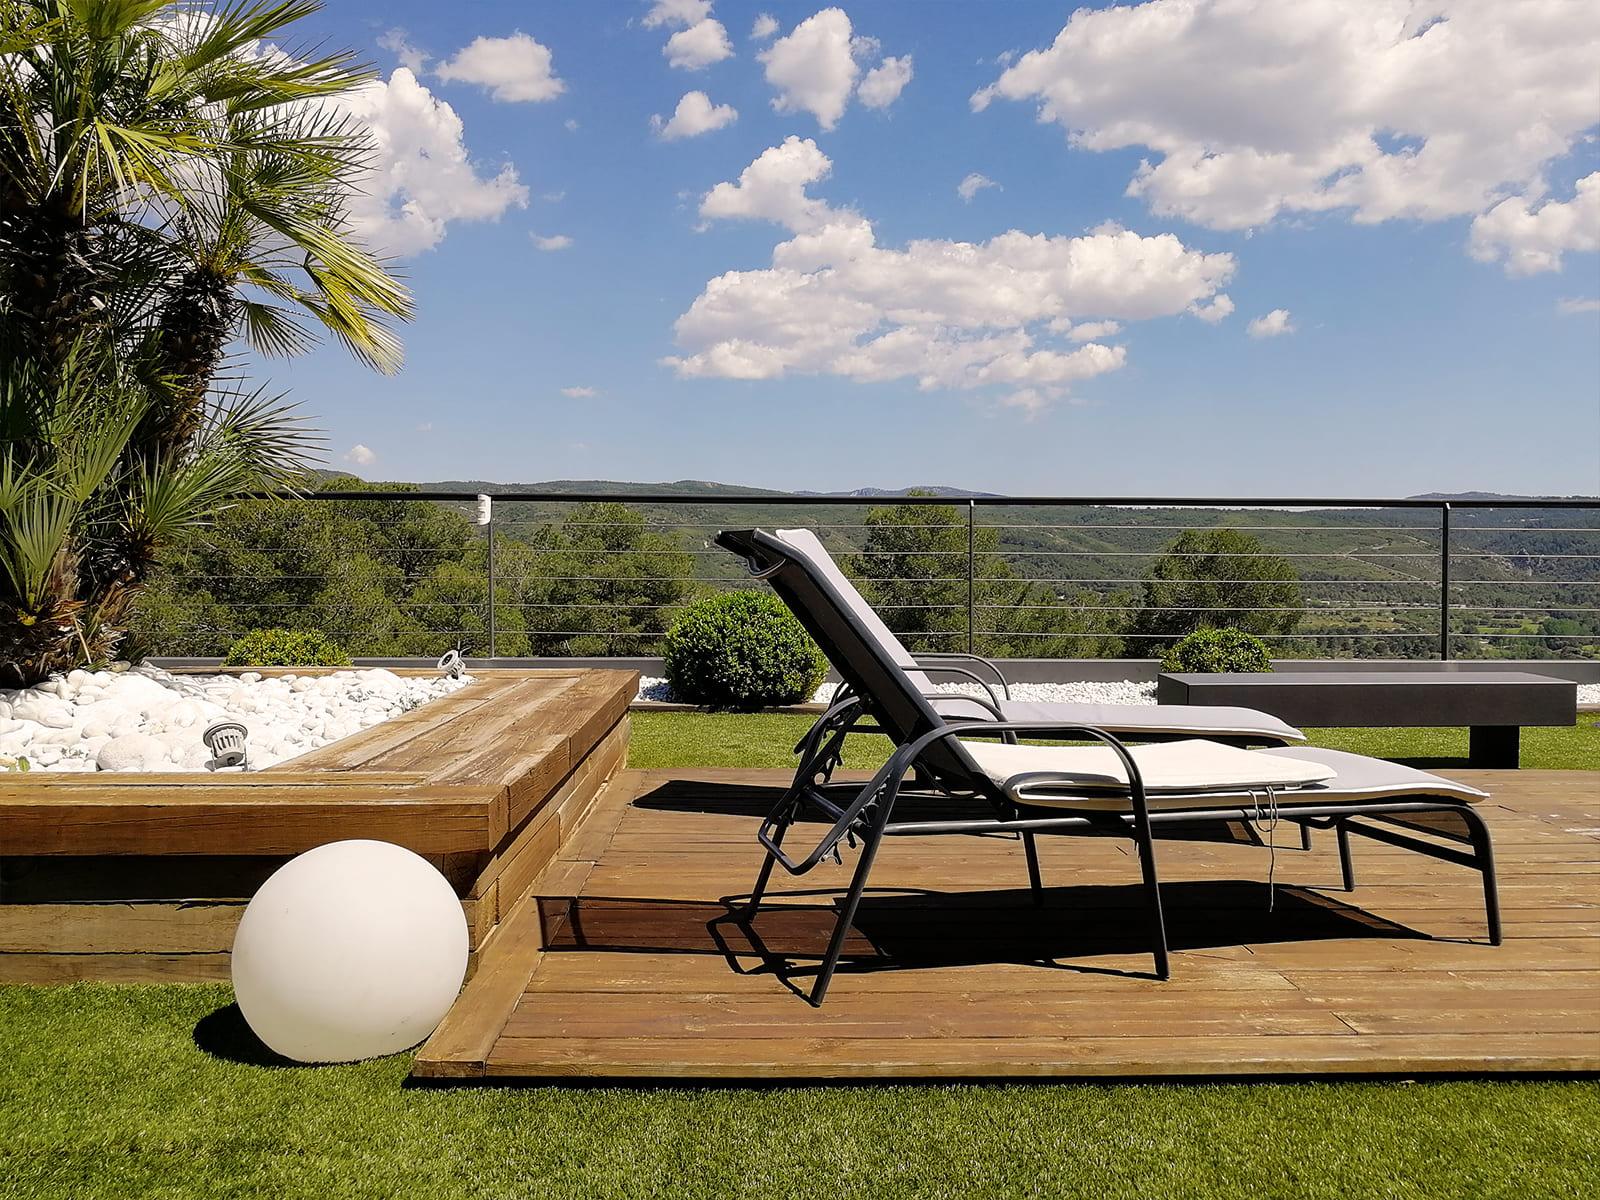 diseño-jardines-piscina-solarium-madera-IJ-15_HIDROJARDIN-Bañeres.jpg